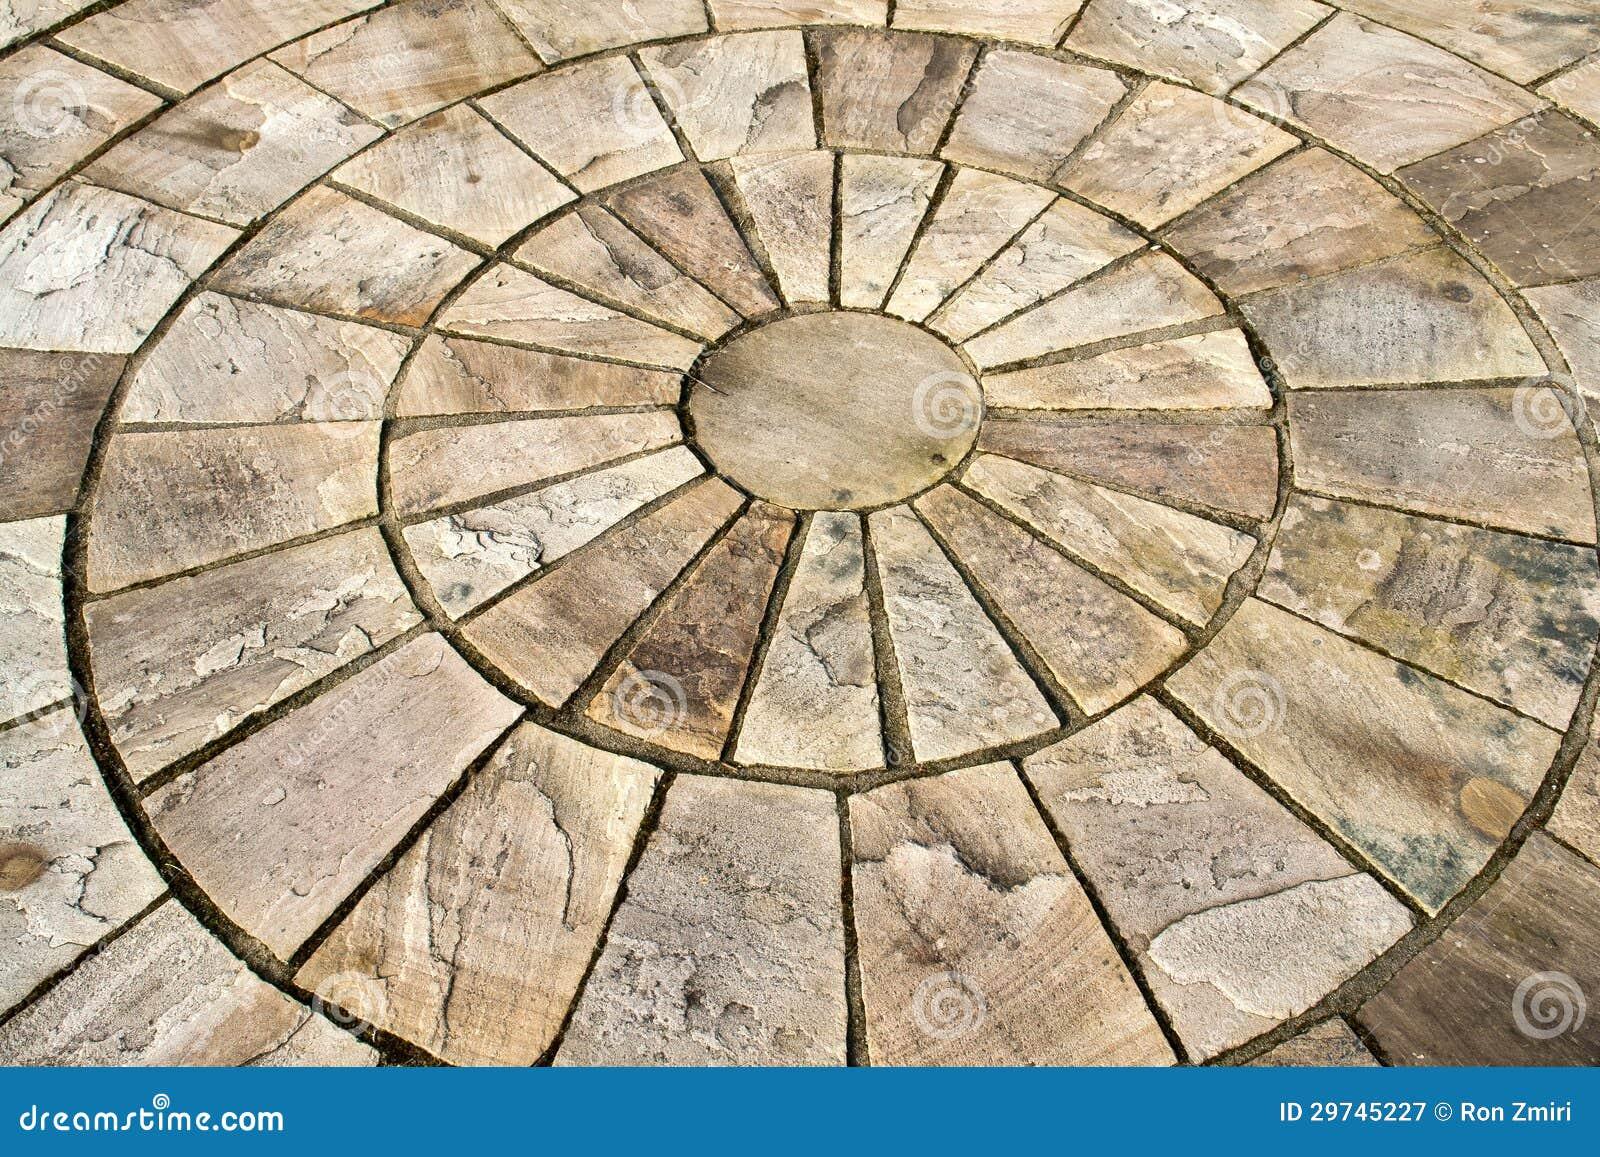 Display of stone floor tiles circle royalty free stock - Garden floor tiles design ...